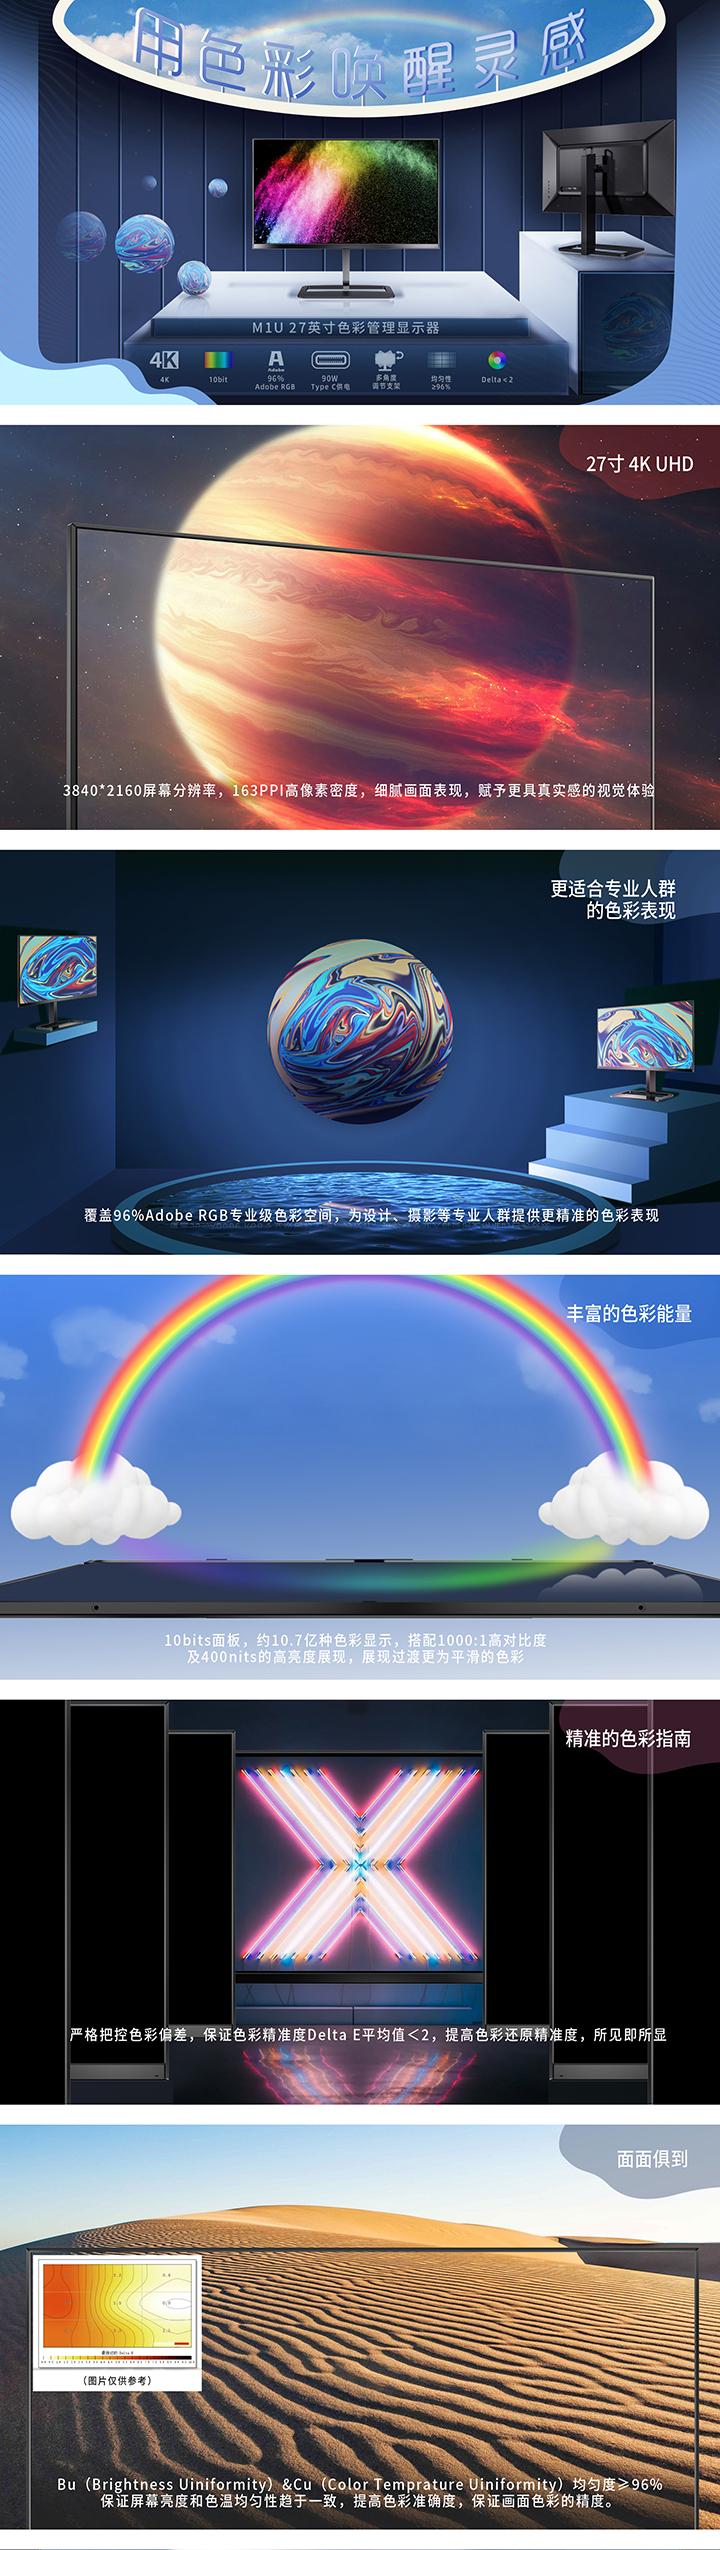 INNOCN色彩管理显示器免费试用,评测